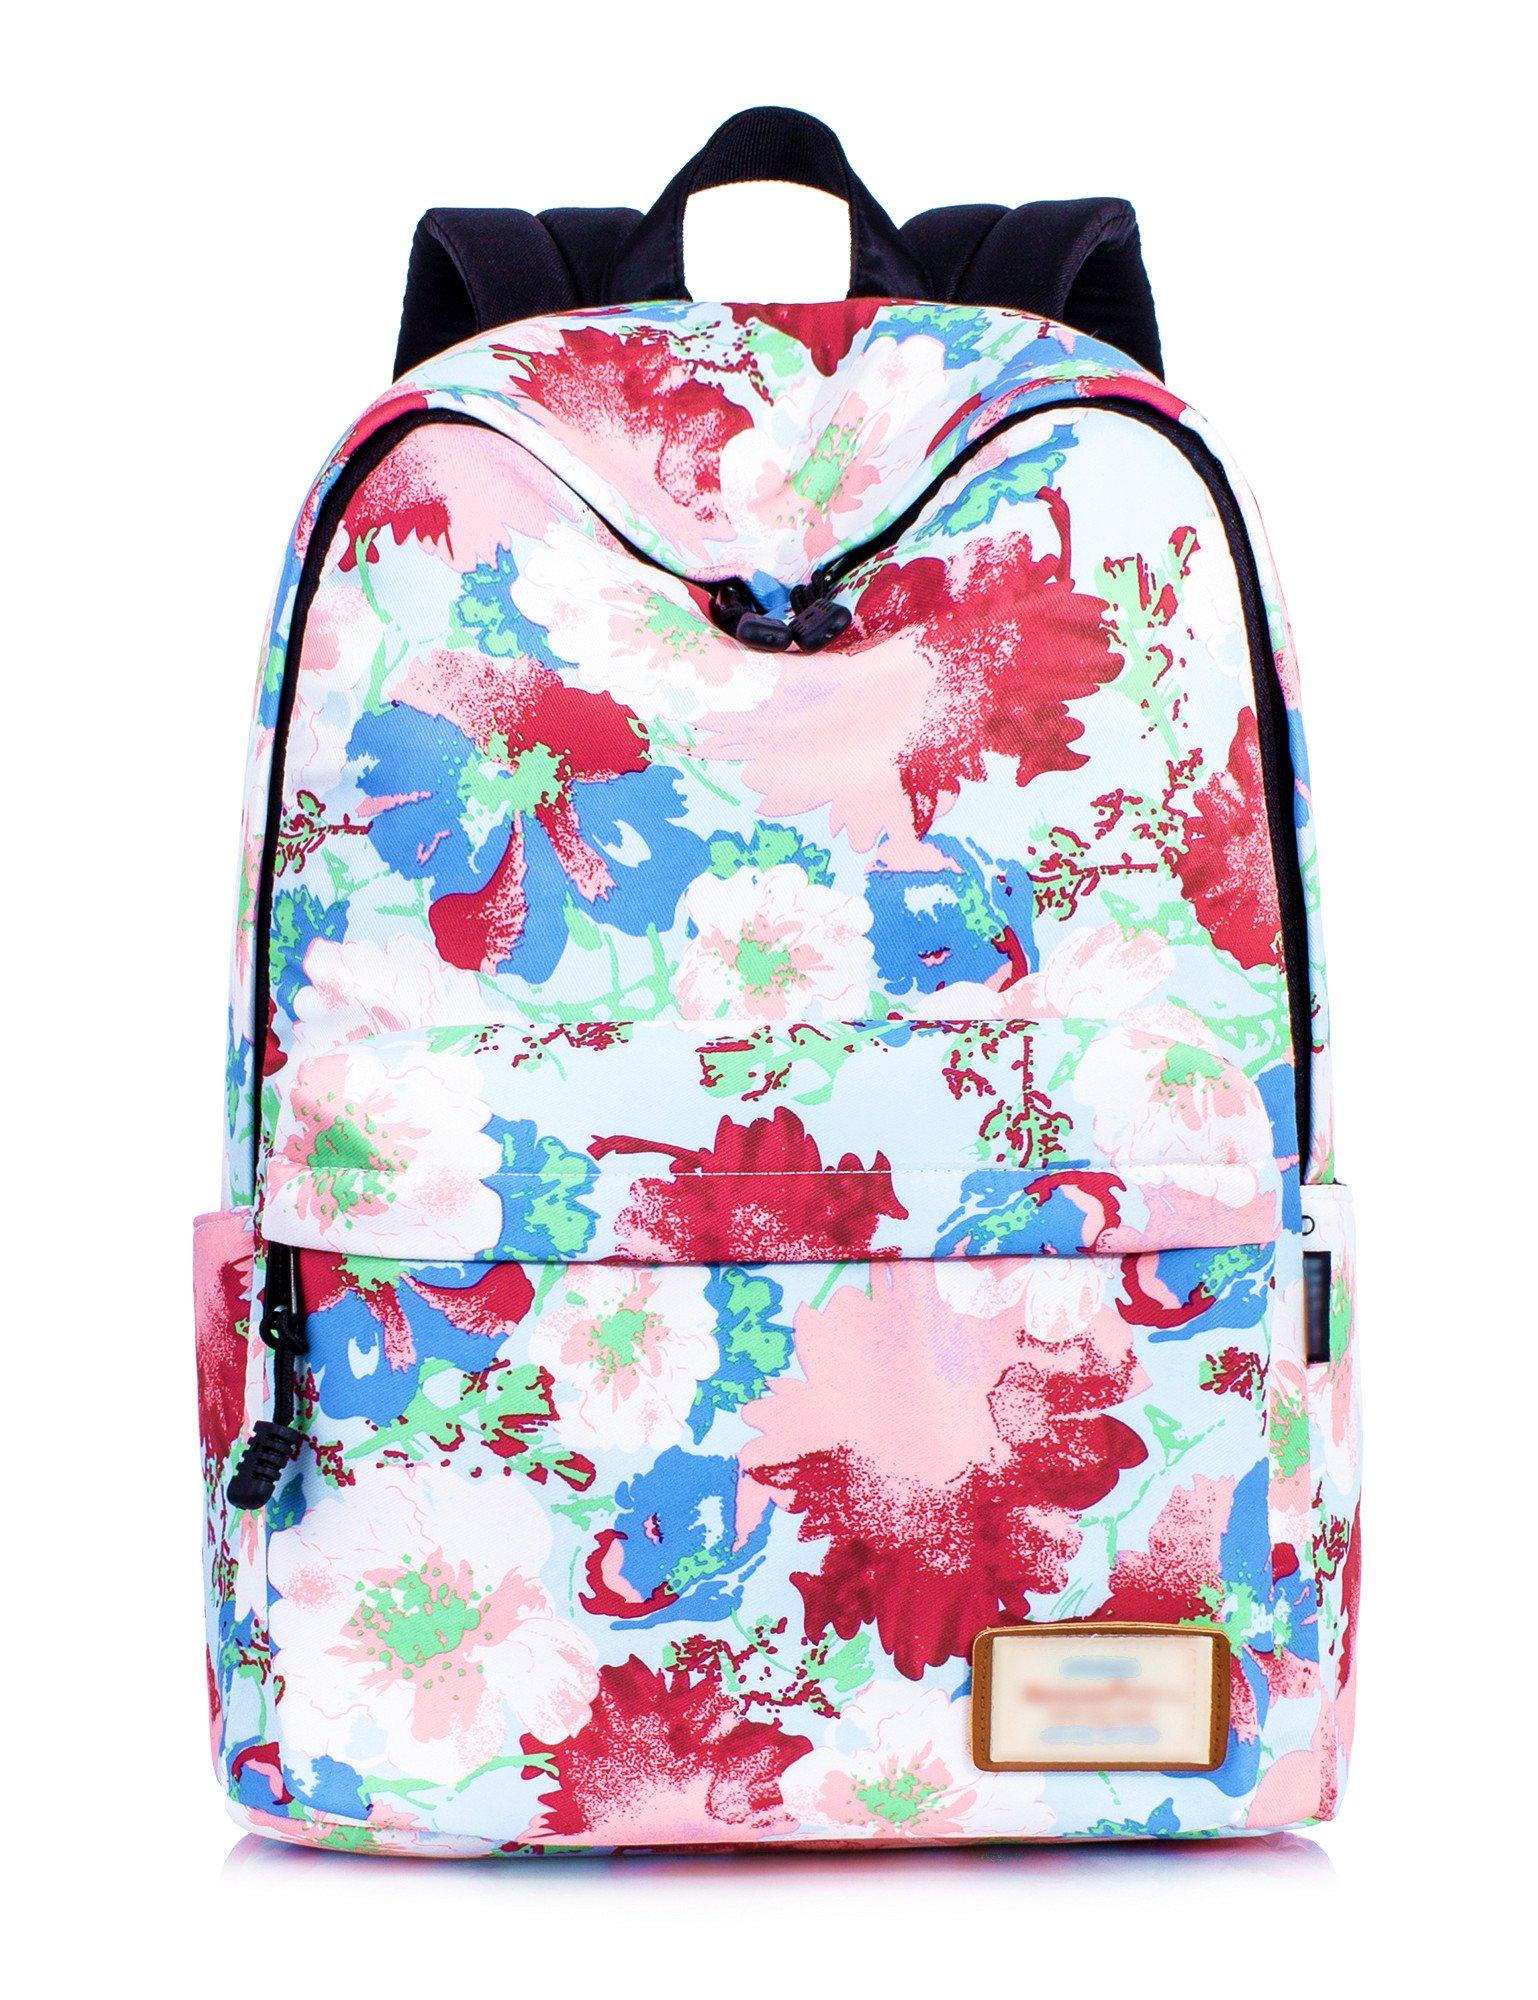 6211d45ebc Galleon - Leaper Stylish Floral Laptop Backpack Women Daypack Travel Bag  Satchel Handbag (Floral Blue)